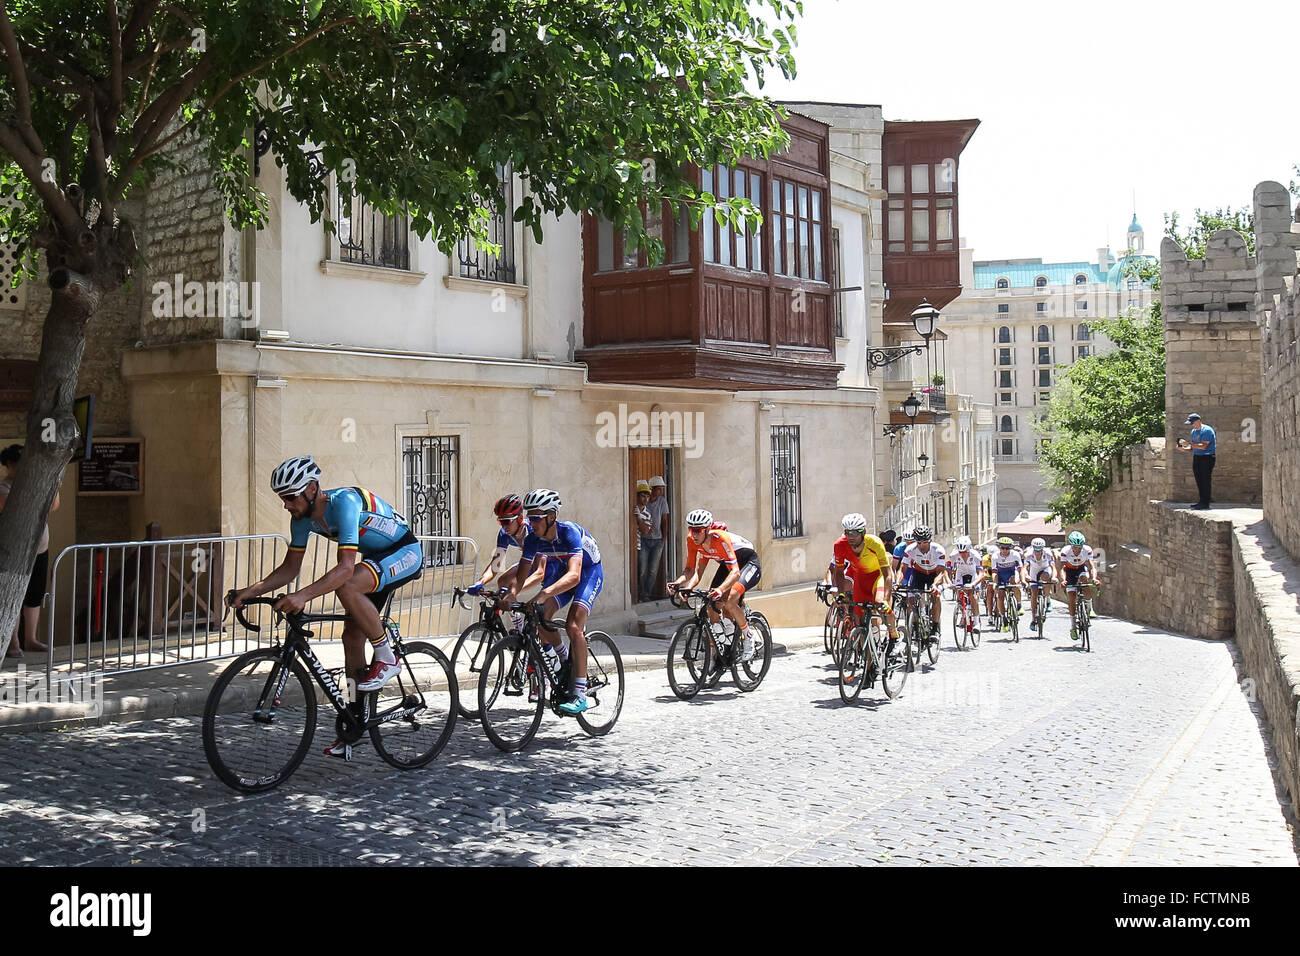 Uomini la gara su strada ciclismo. La città vecchia. Baku2015. 1° European Games. Baku. Azerbaigian. 21/06/2015 Foto Stock